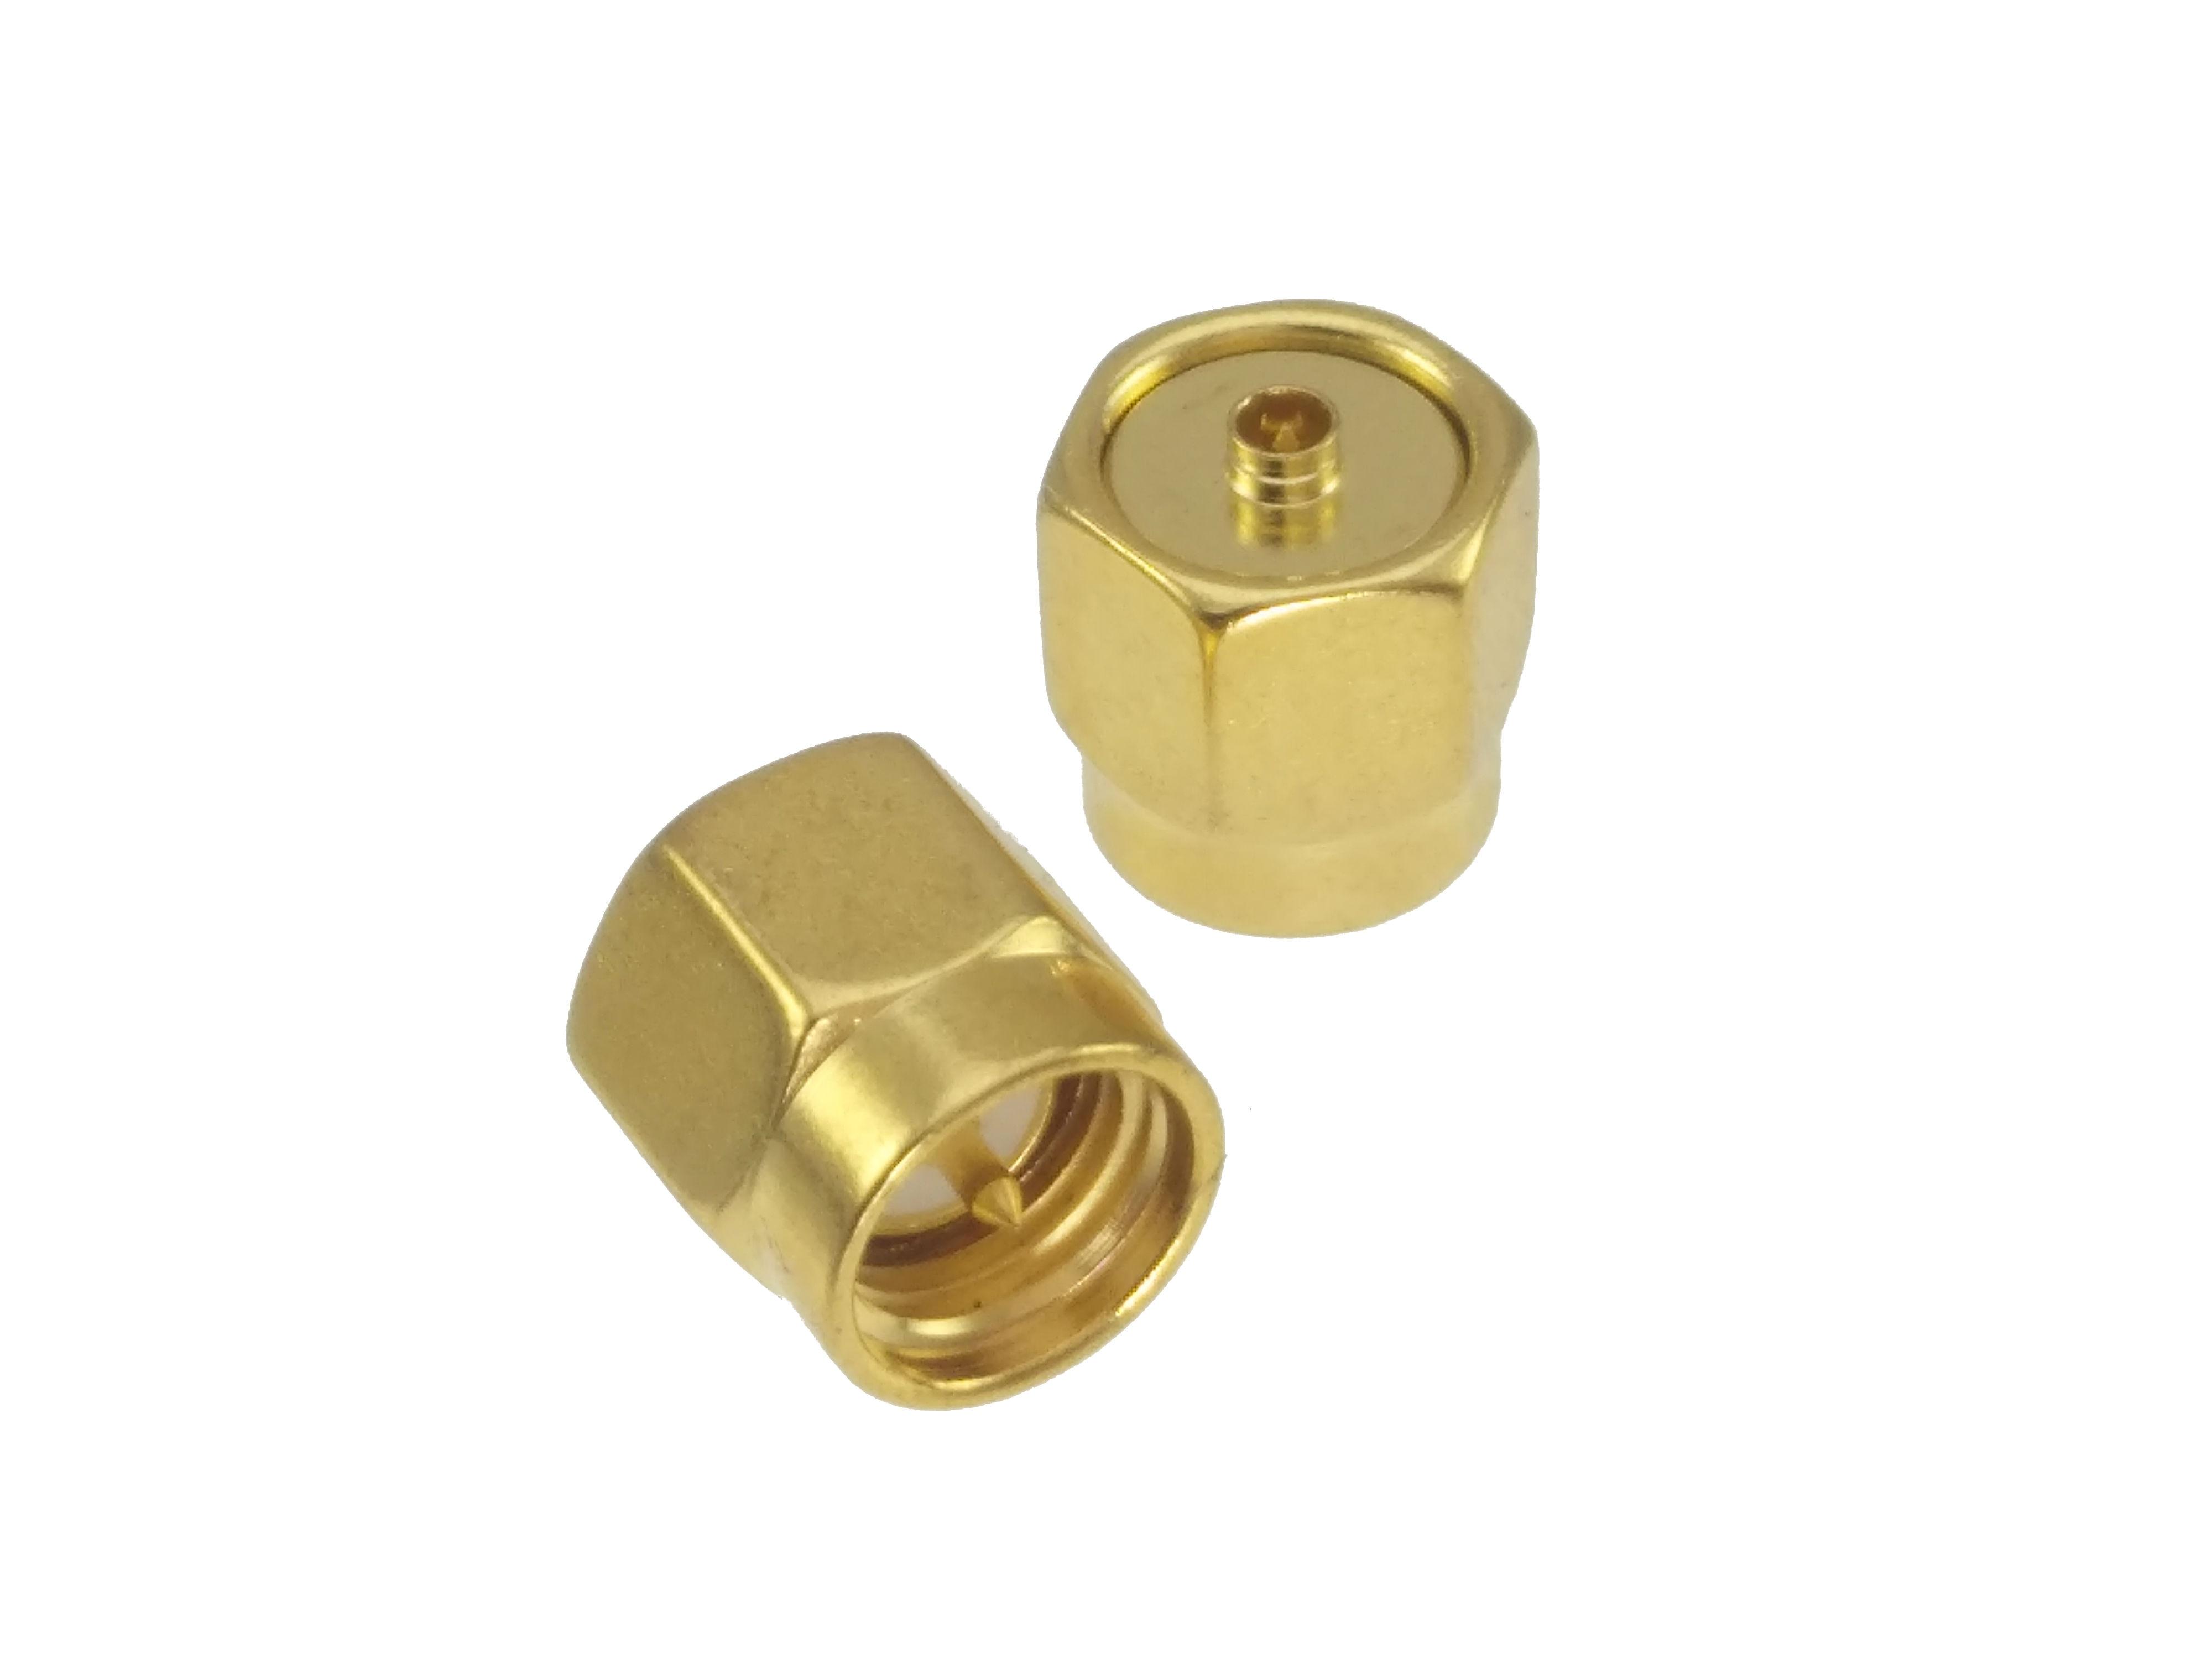 Adapter SMA Male To IPX U.fl Male Plug RF Connector Straight